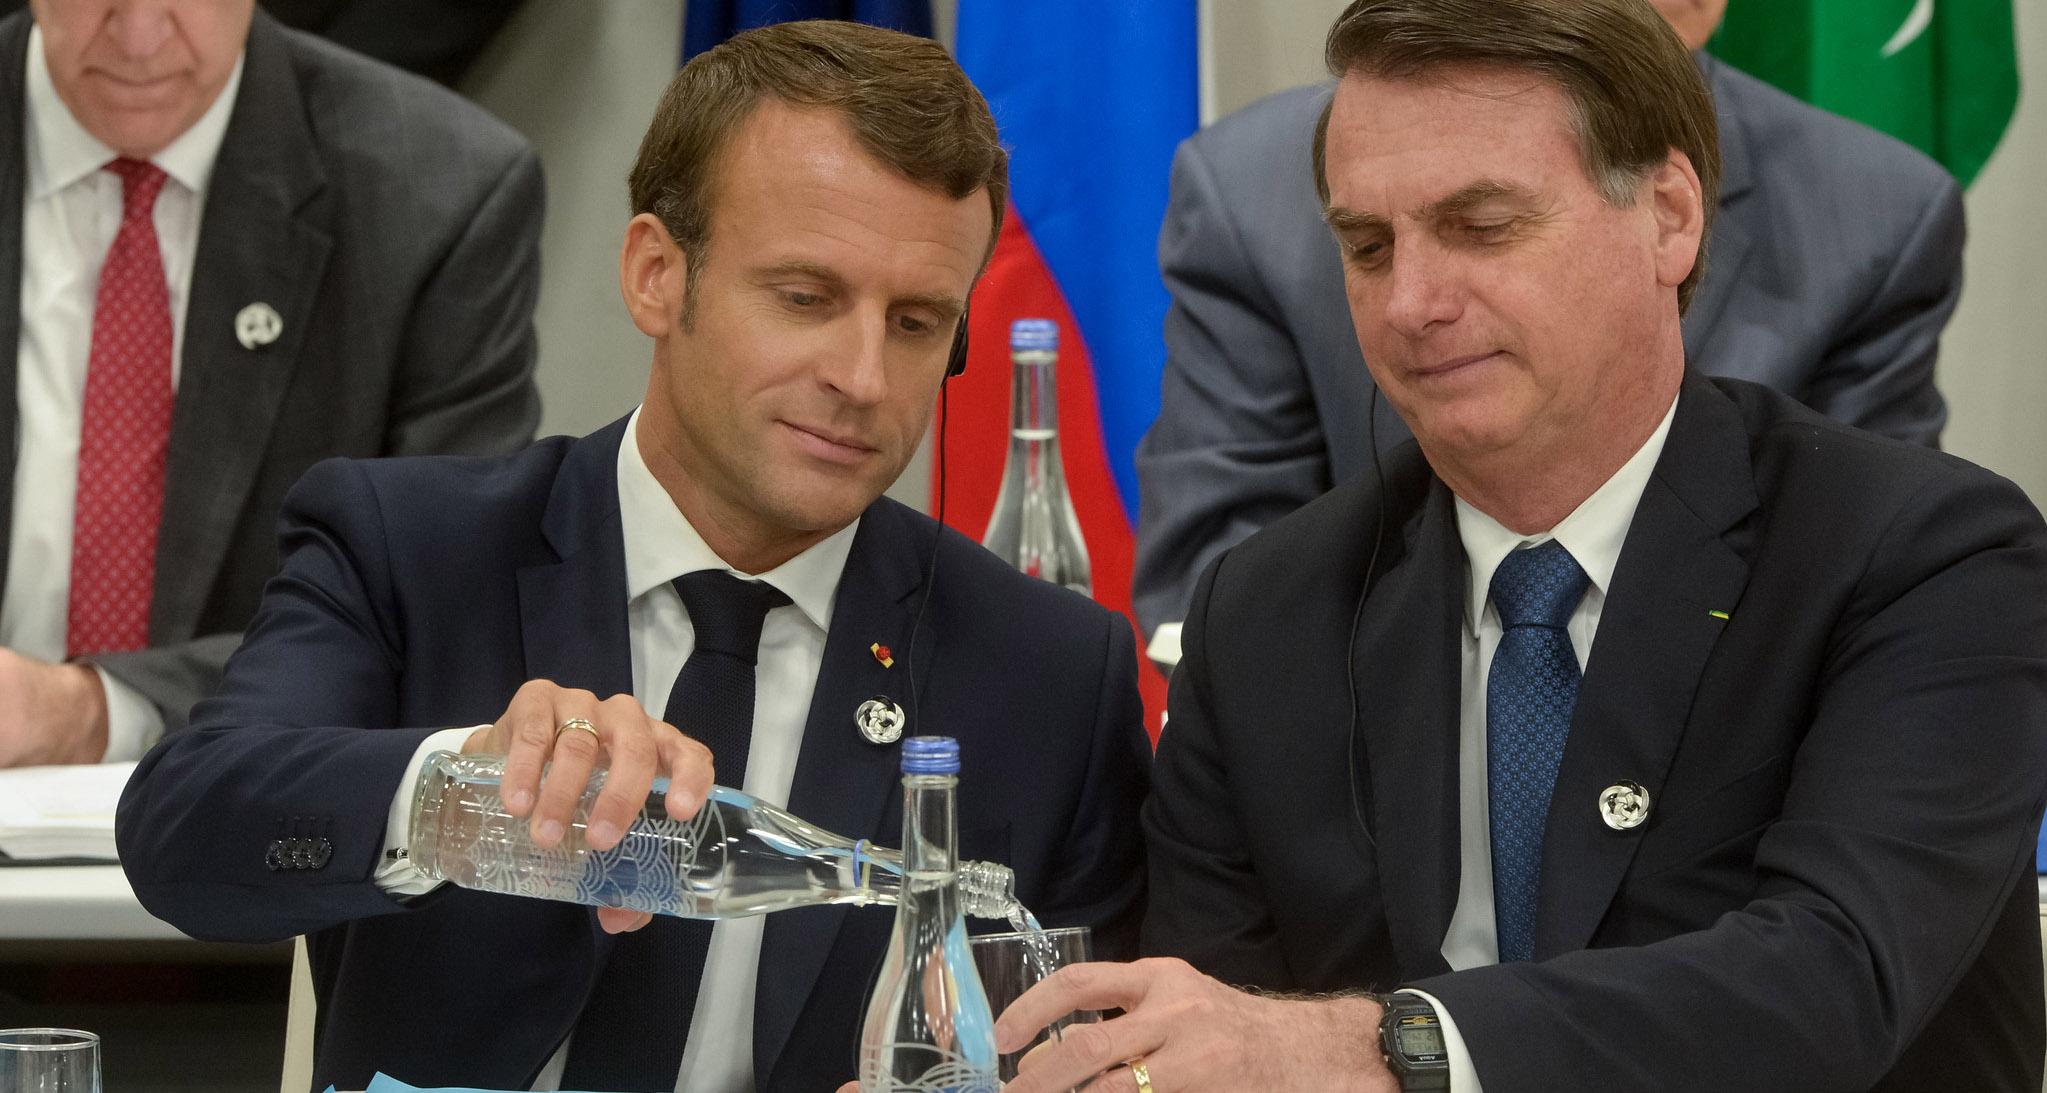 Aonde Levar Macron Amazonia Real